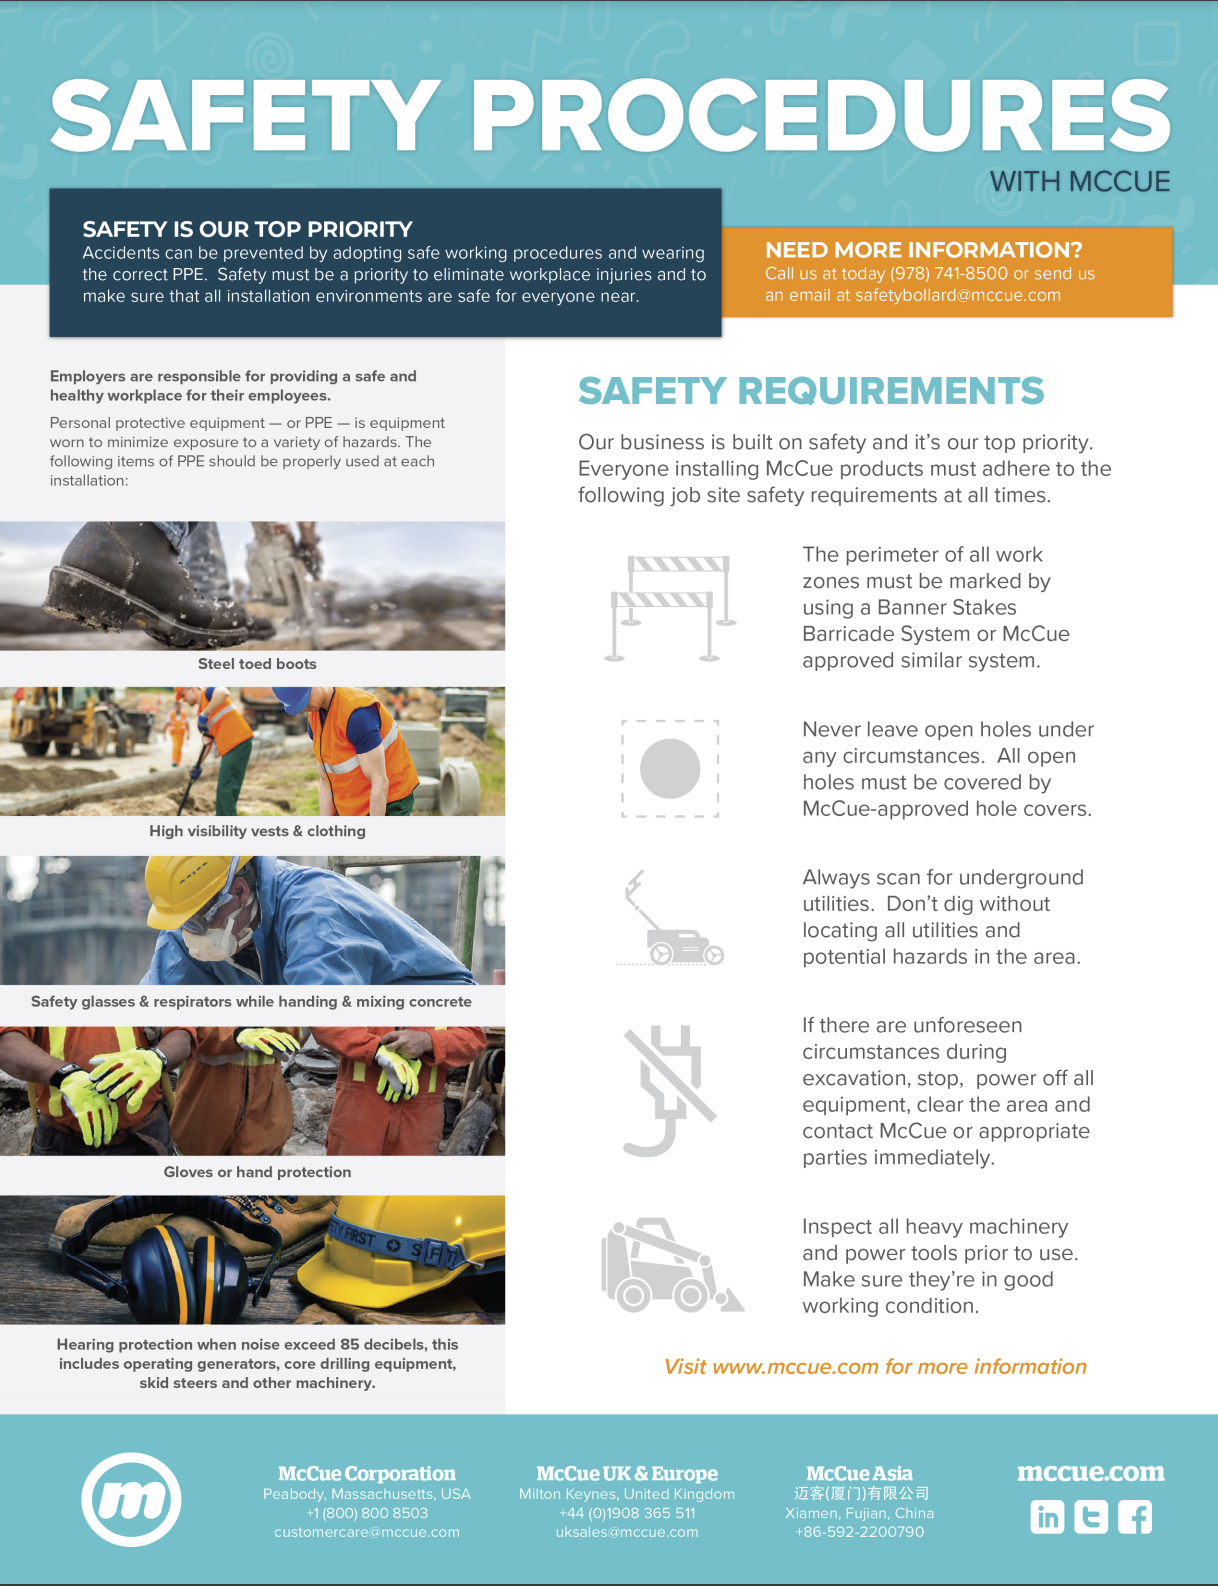 McCue Safety Procedures